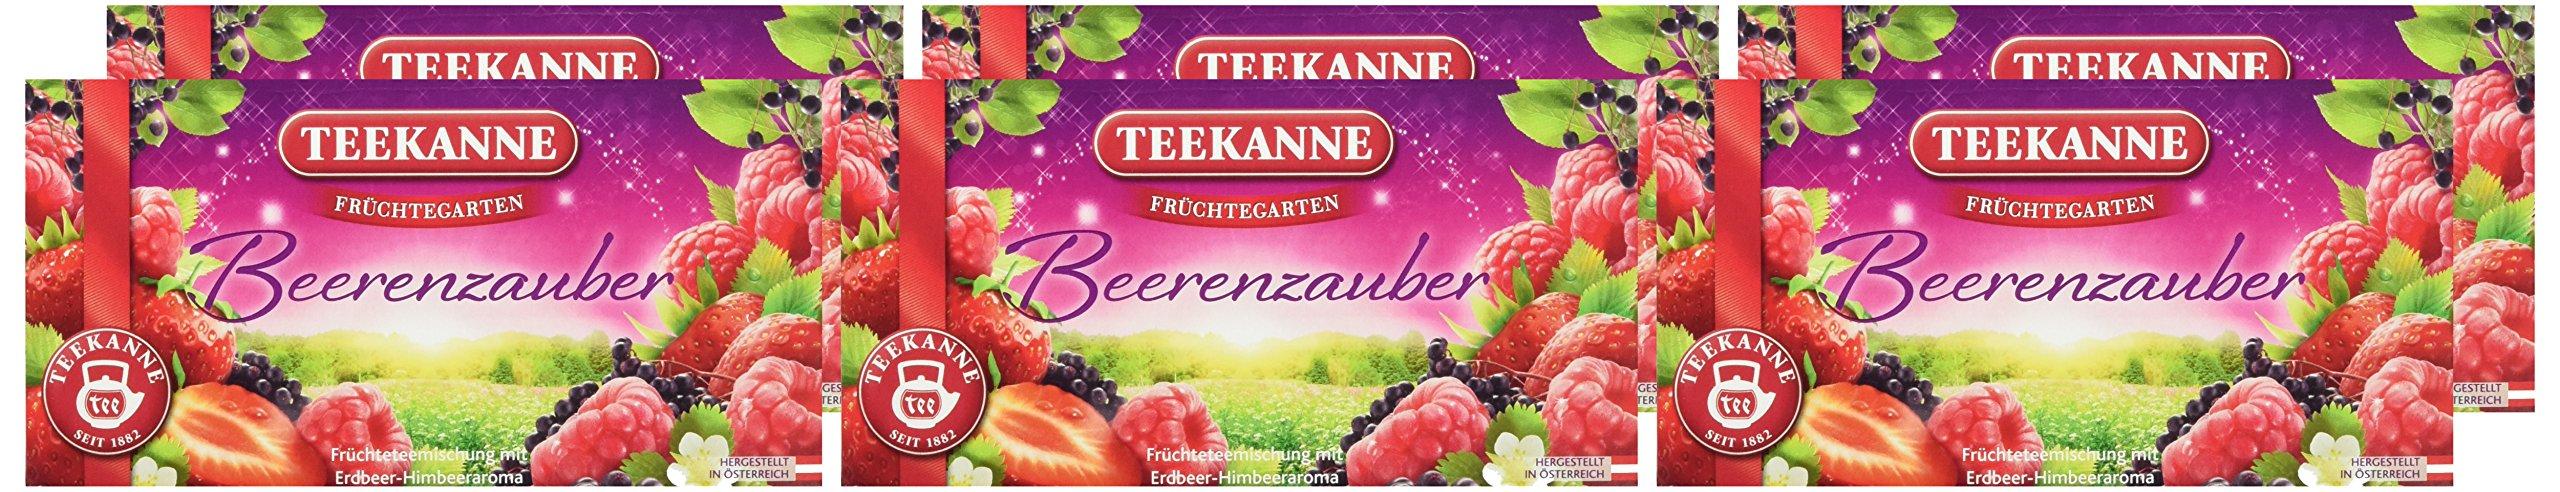 Teekanne-Frchtegarten-Beerenzauber-Tee-20-Beutel-6er-Pack-6-x-60-g